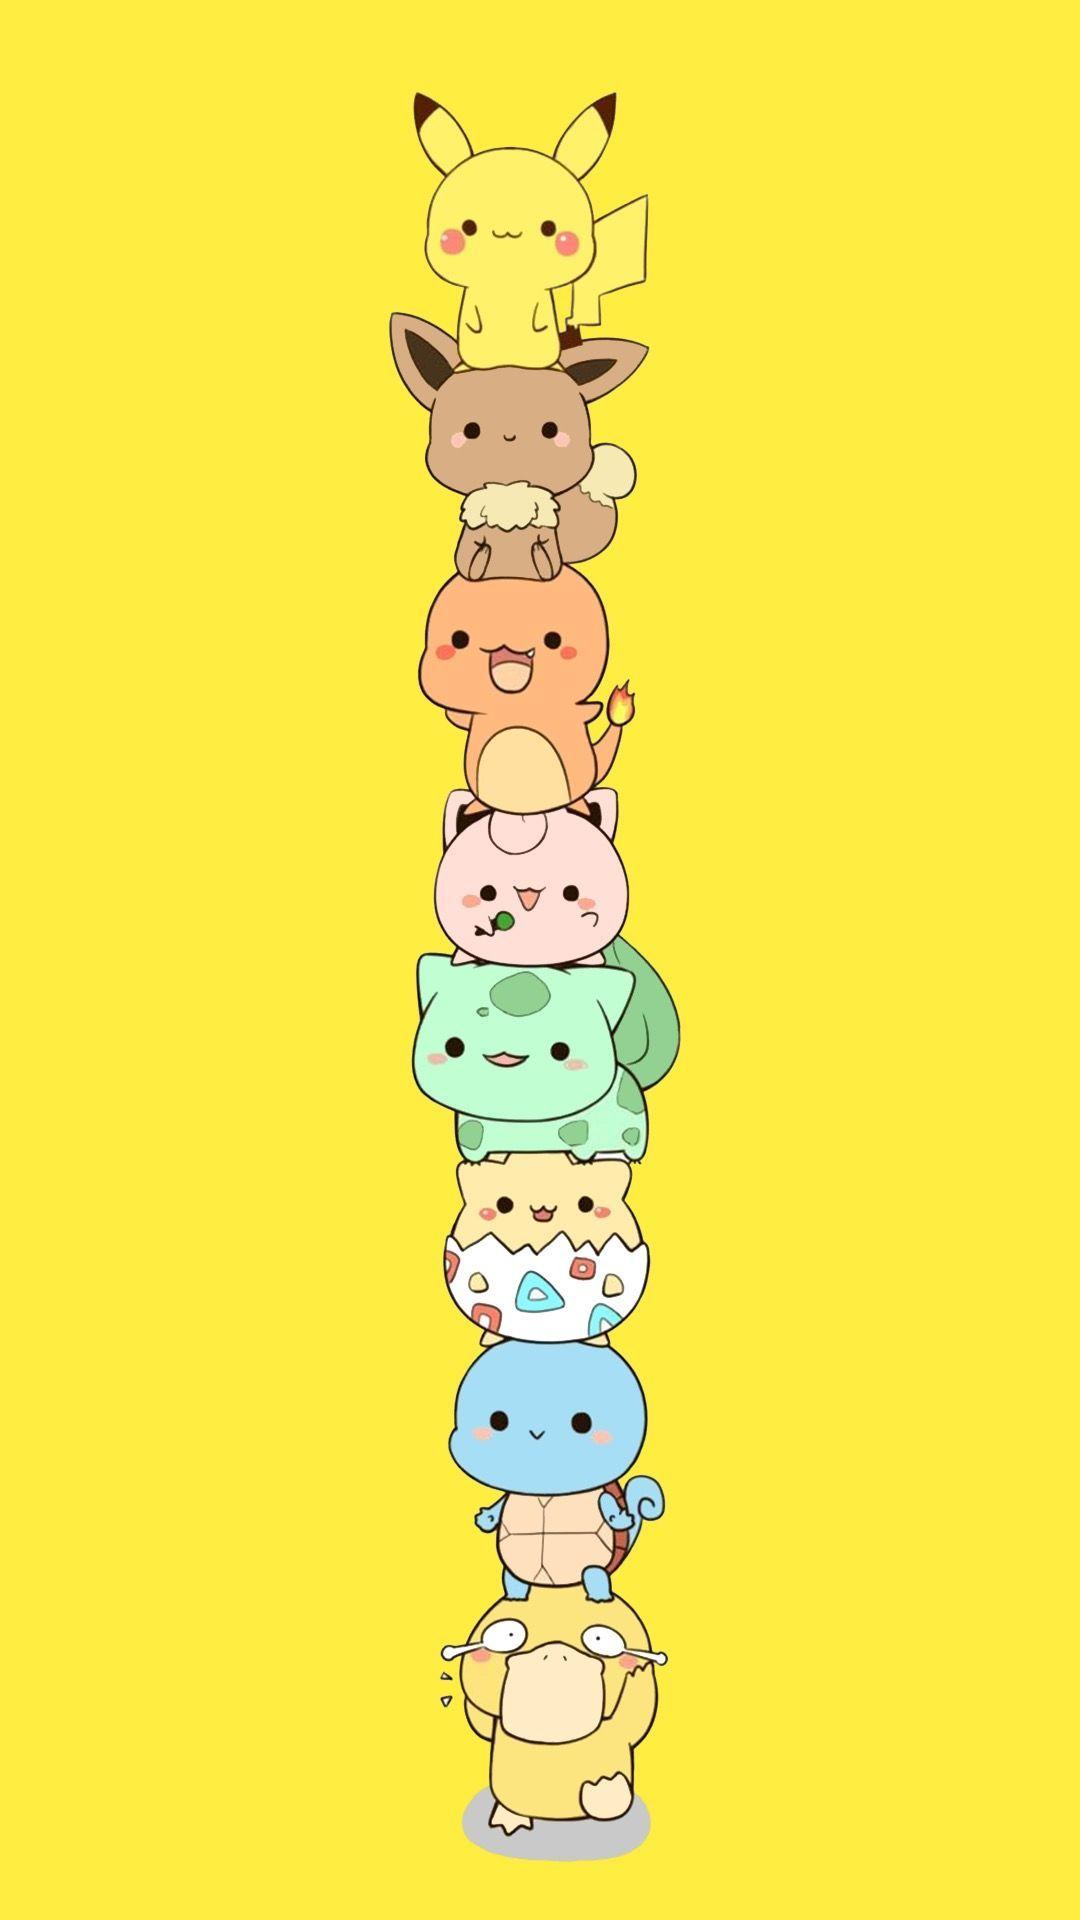 Untitled Cute Cartoon Wallpapers Cute Pokemon Wallpaper Cute Doodles